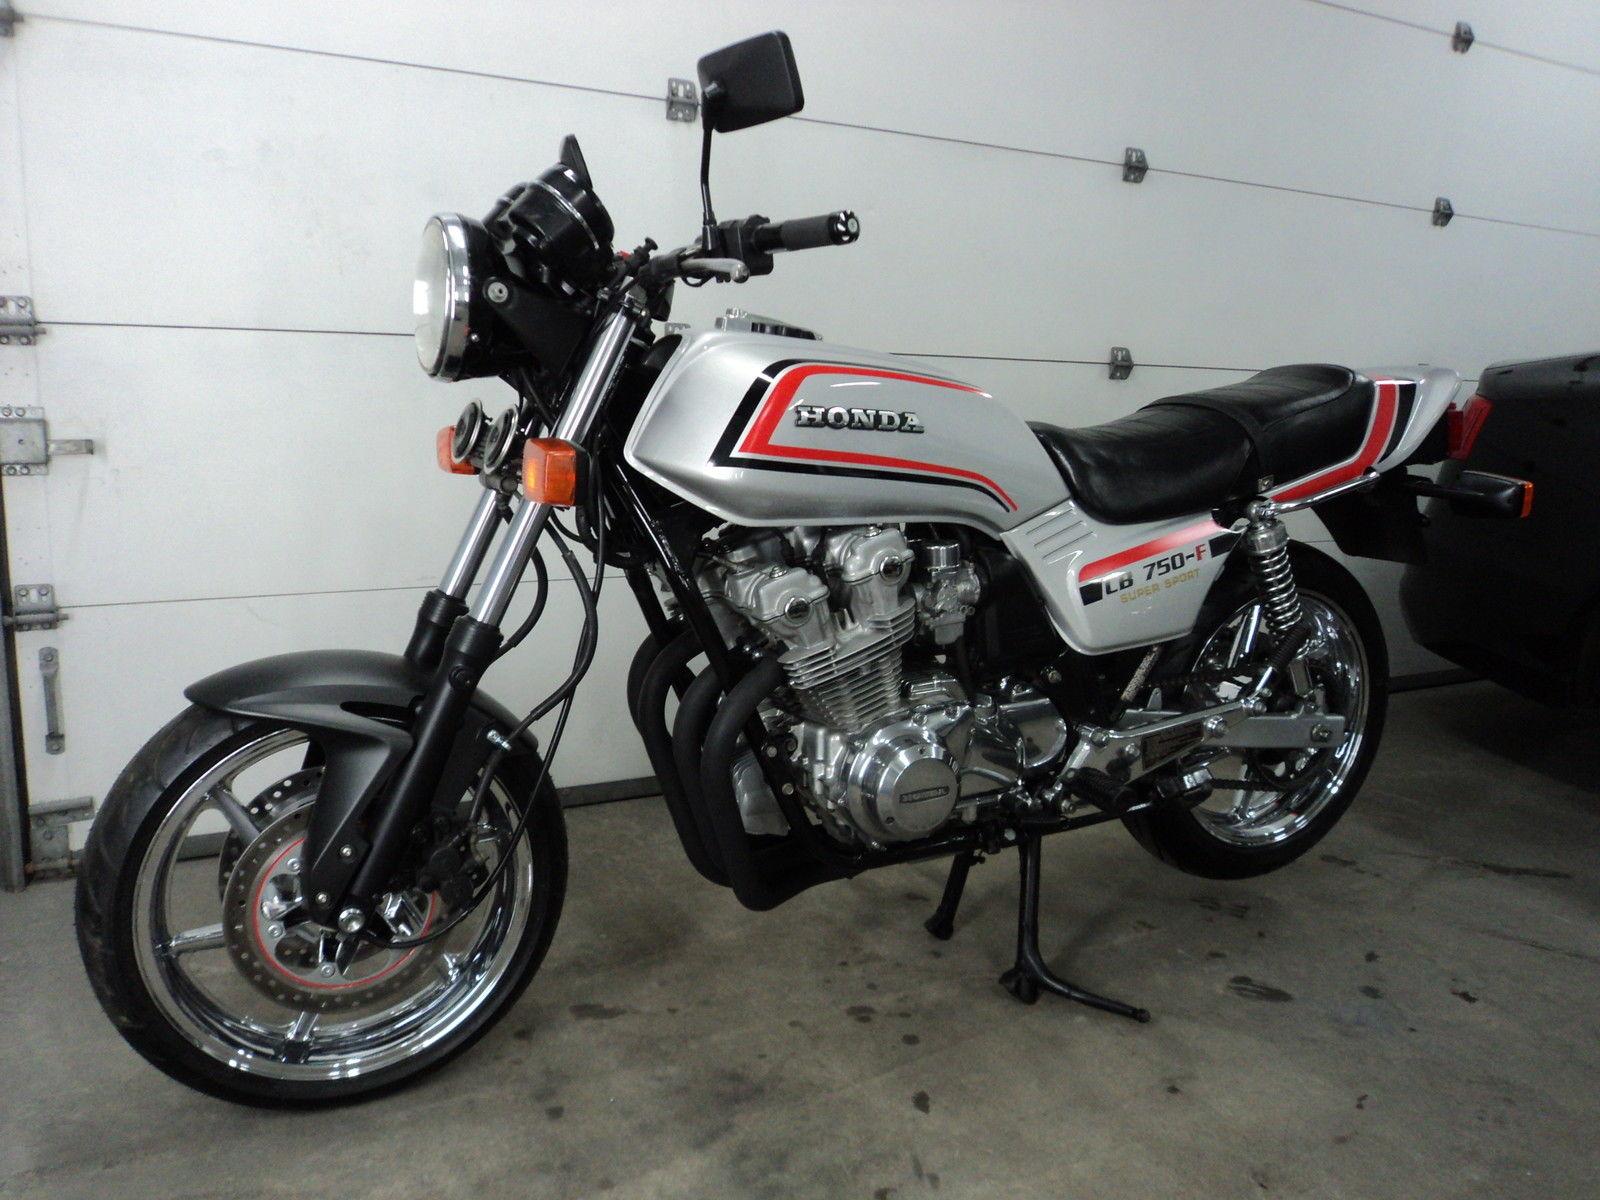 1980 honda cb750f super sport bike urious rh bike urious com 1980 honda 750 f super sport 1980 honda cb750f super sport